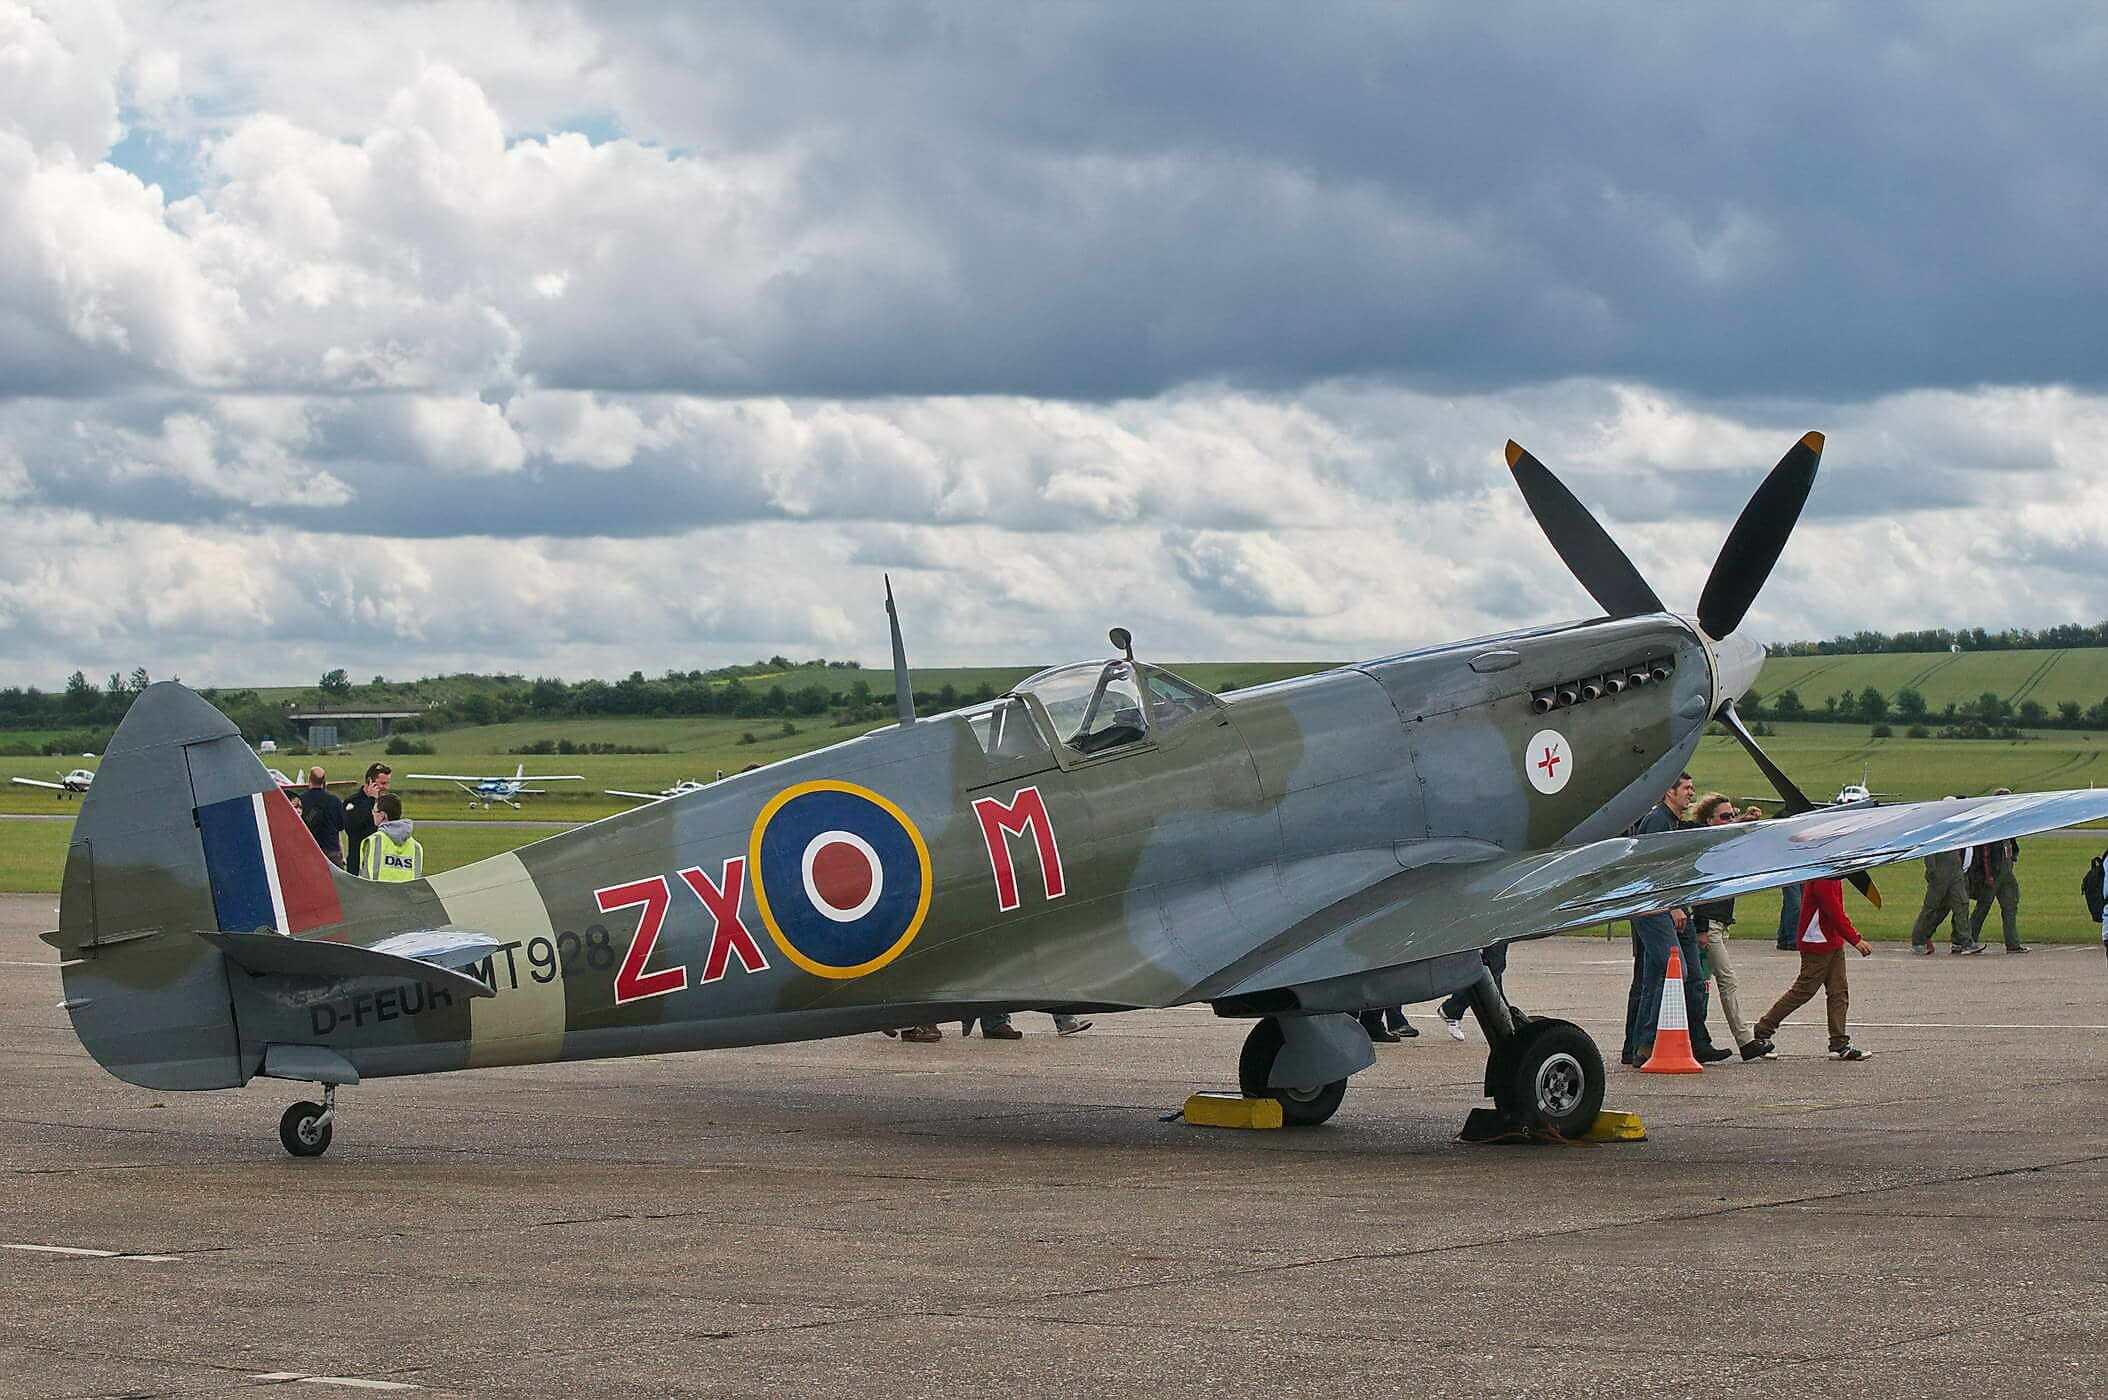 Supermarine Spitfire HF Mk VIIIc MT928